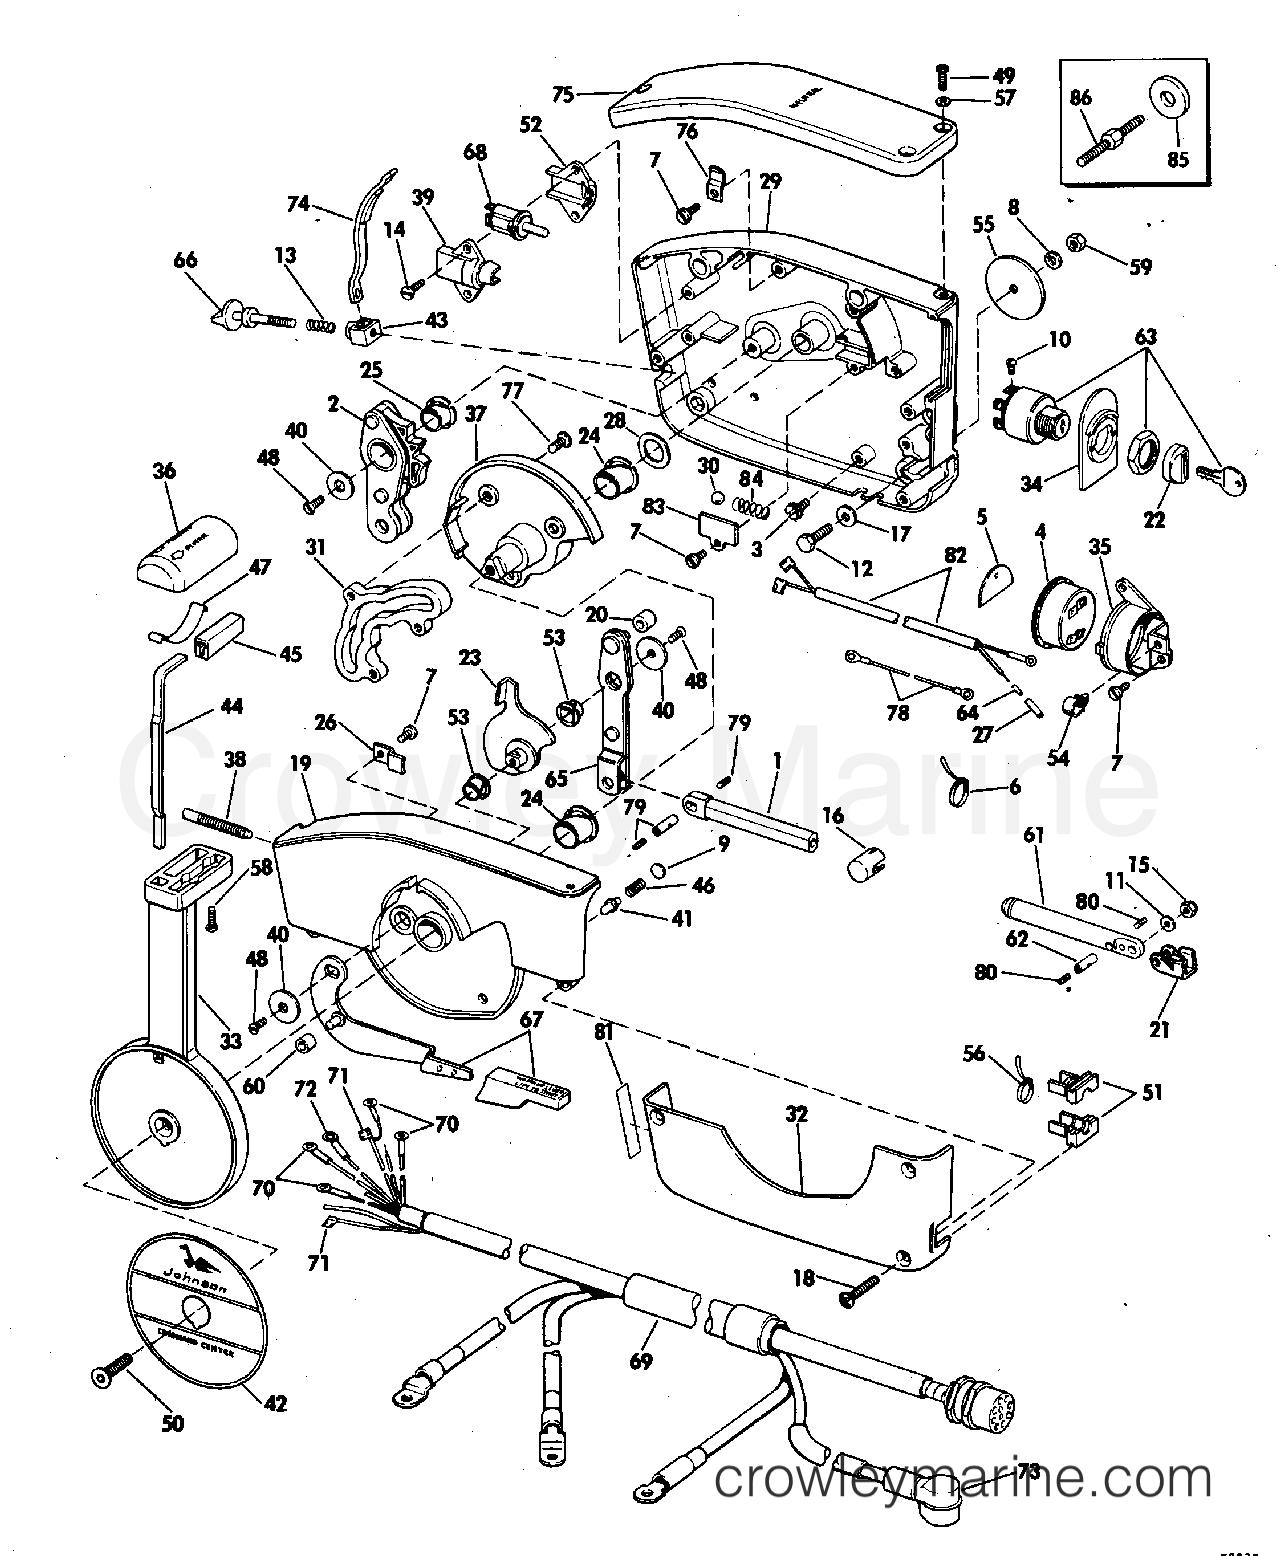 LS_2478] Diagram Of 1978 70El78C Johnson Outboard Motor Cover Diagram And  Parts Schematic WiringDext Simij Mous Intel Getap Ilari Bachi Gresi Tool Kapemie Mohammedshrine  Librar Wiring 101